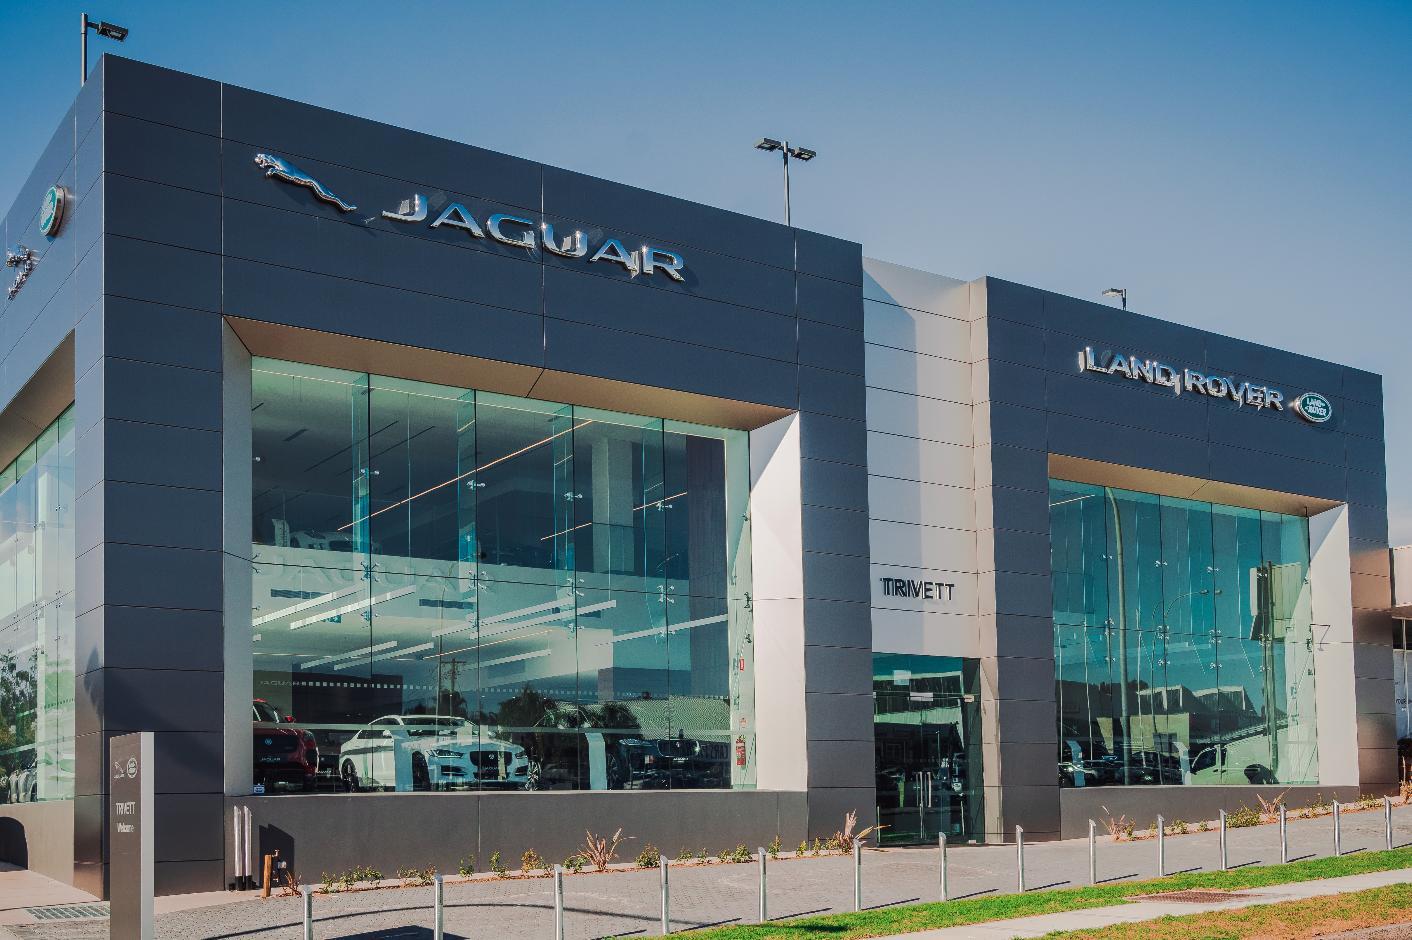 Land Rover Dealership >> Trivett Land Rover Alexandria Land Rover Retailer In